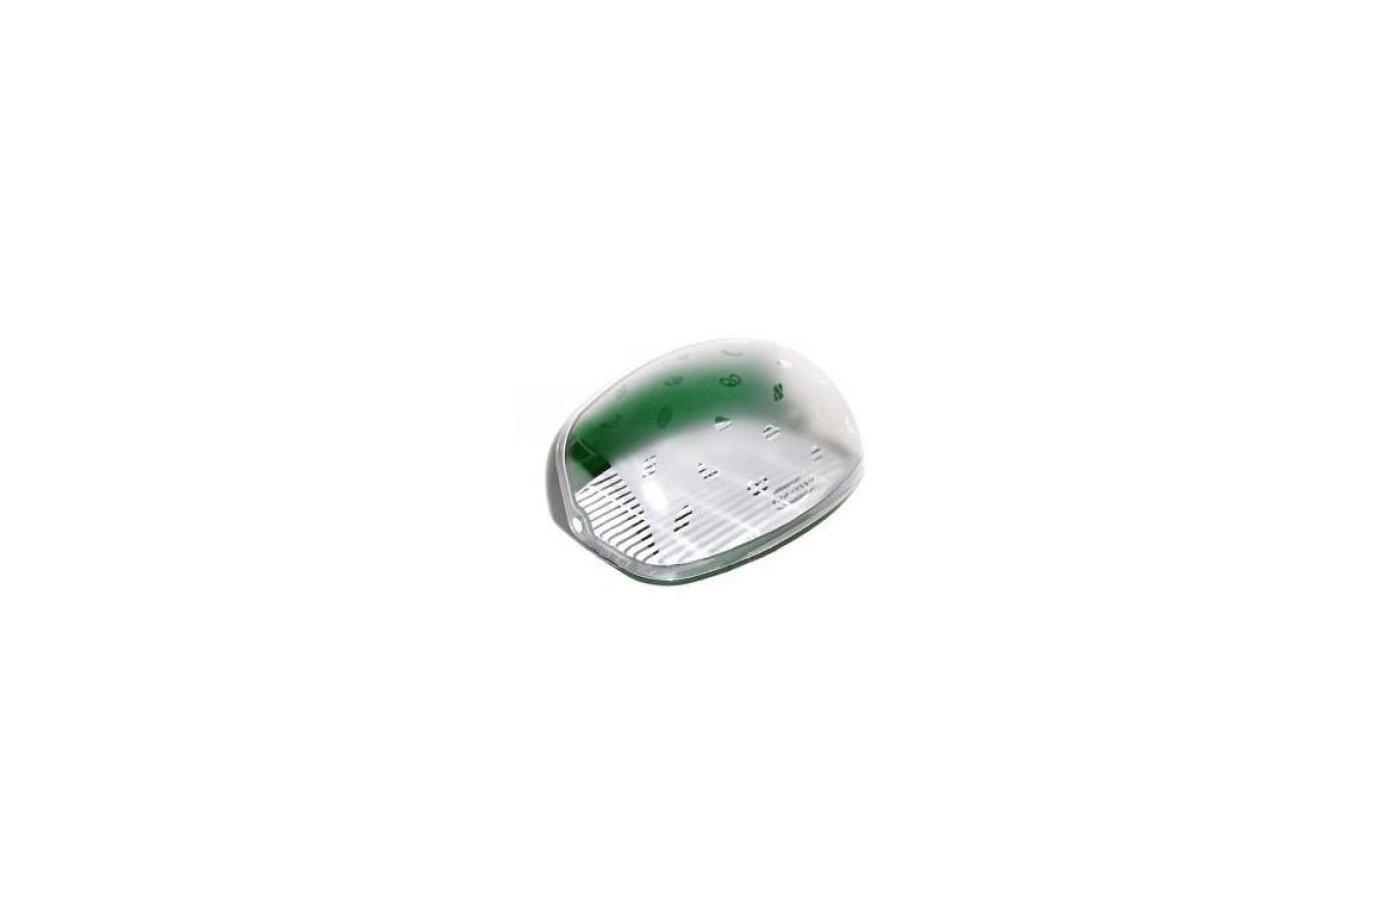 хлебница BEROSSI 04111 зелёная